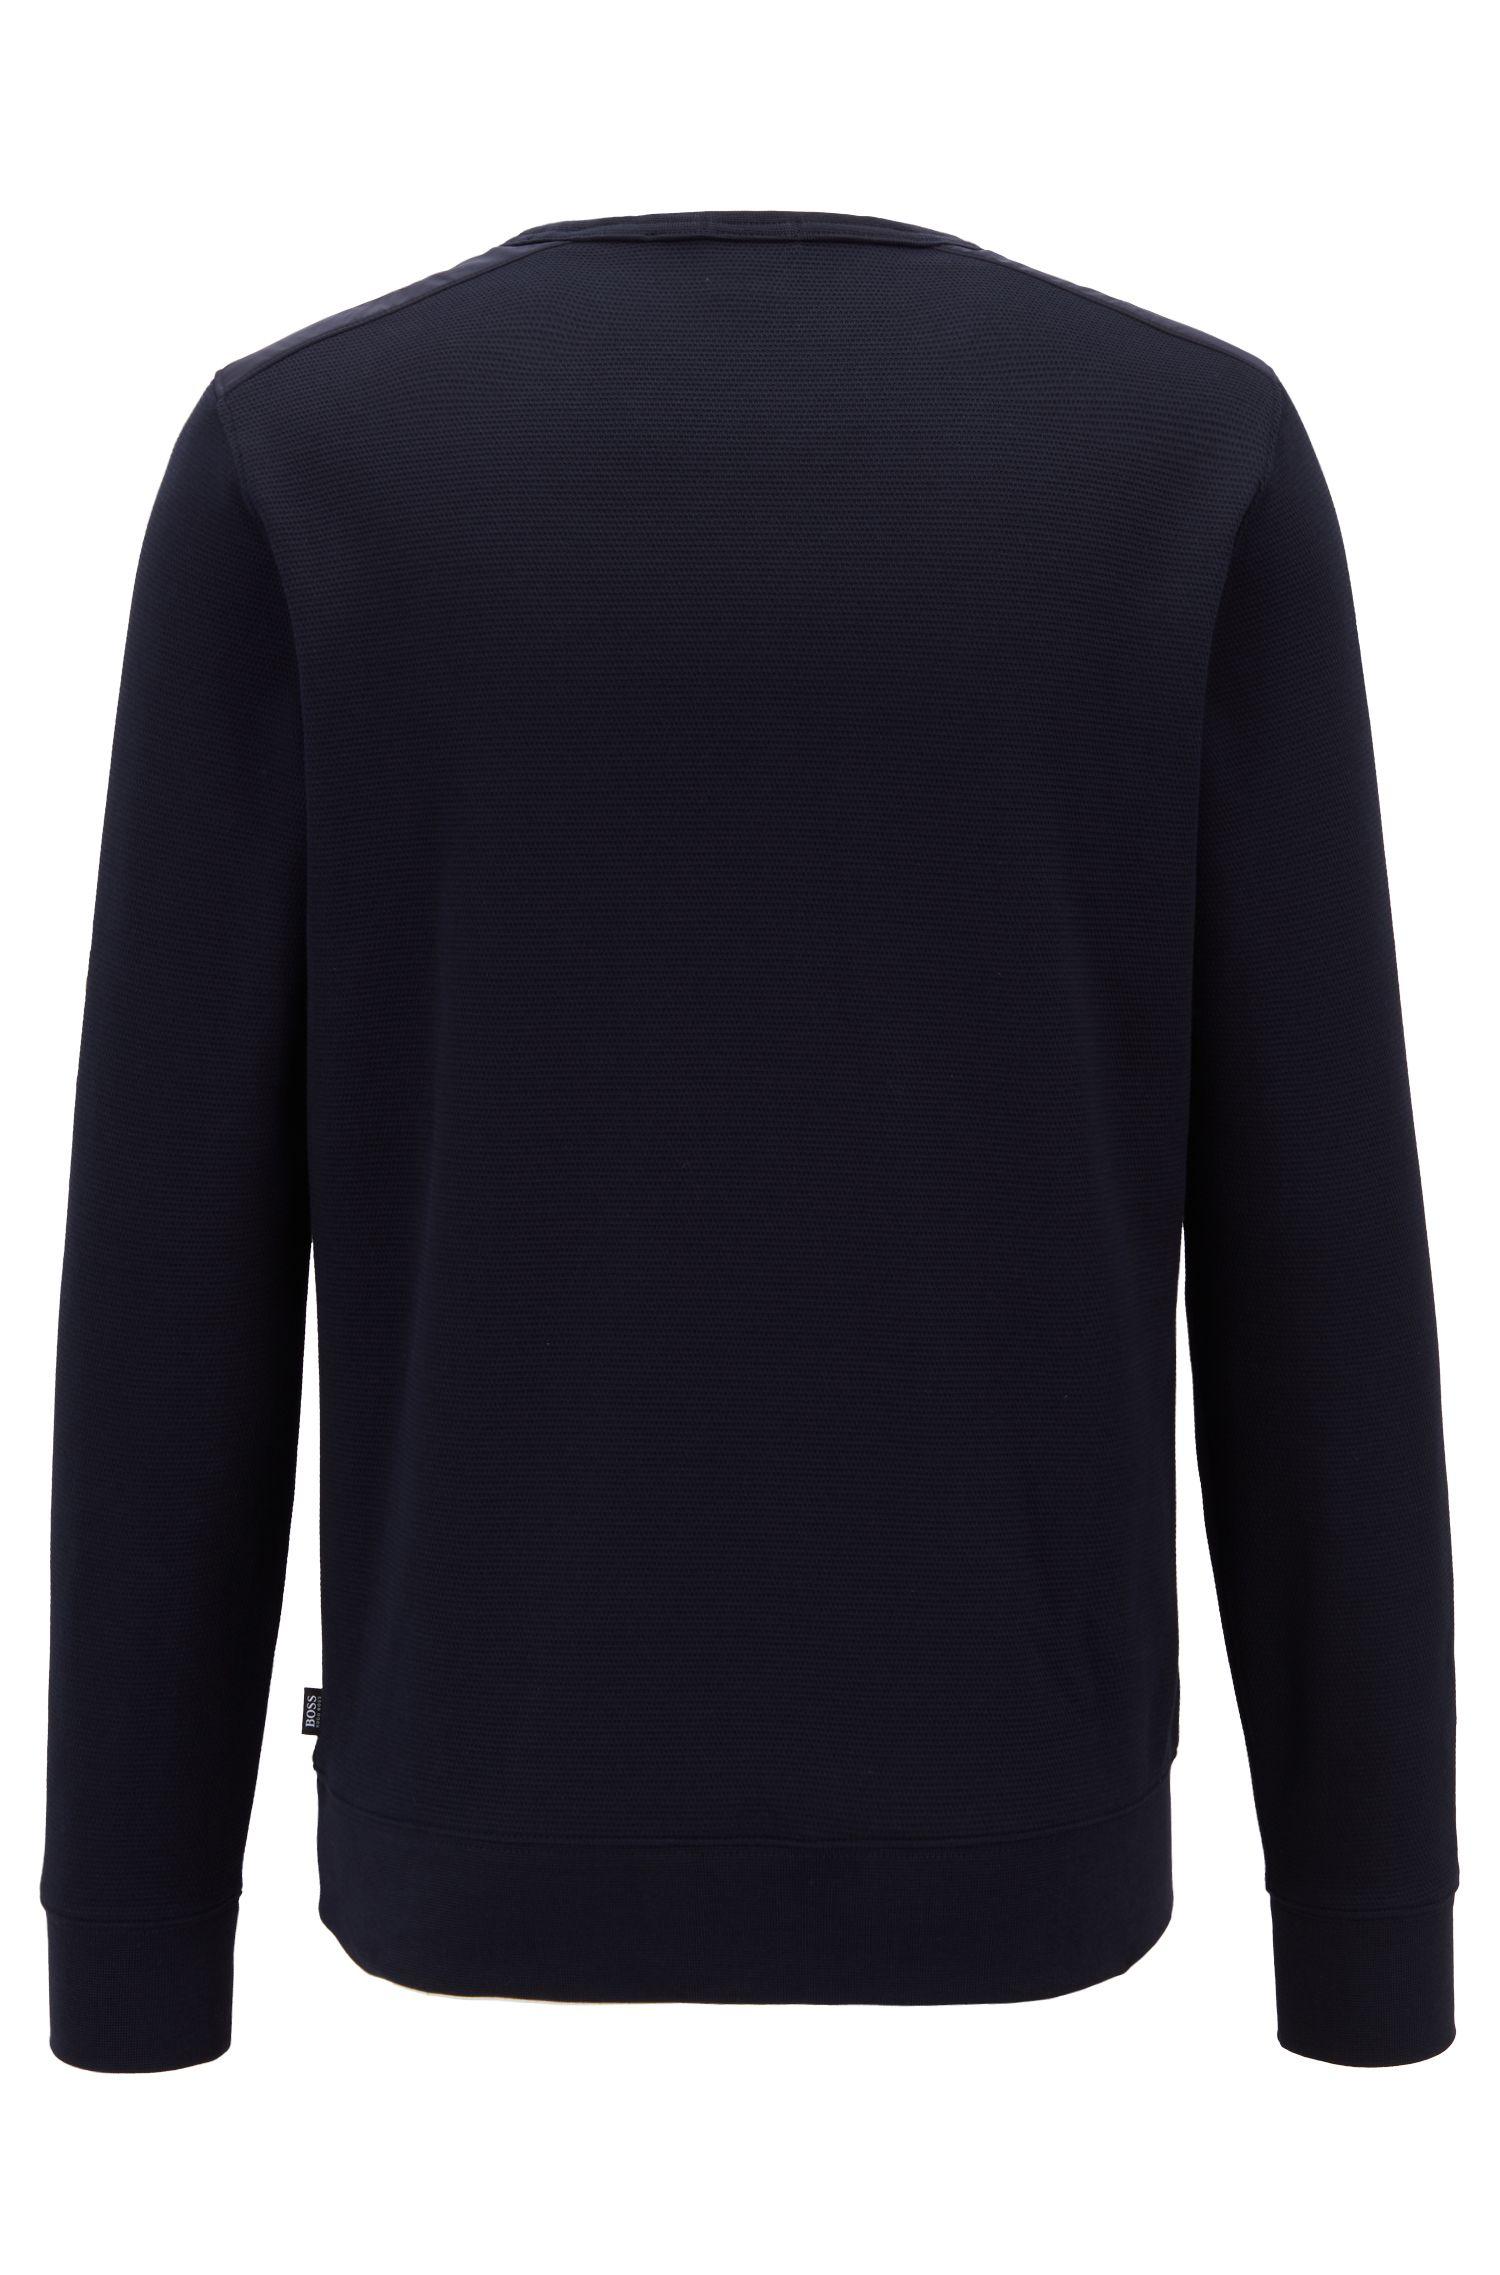 Slim-fit sweatshirt in a structured cotton blend with contrast inserts, Dark Blue